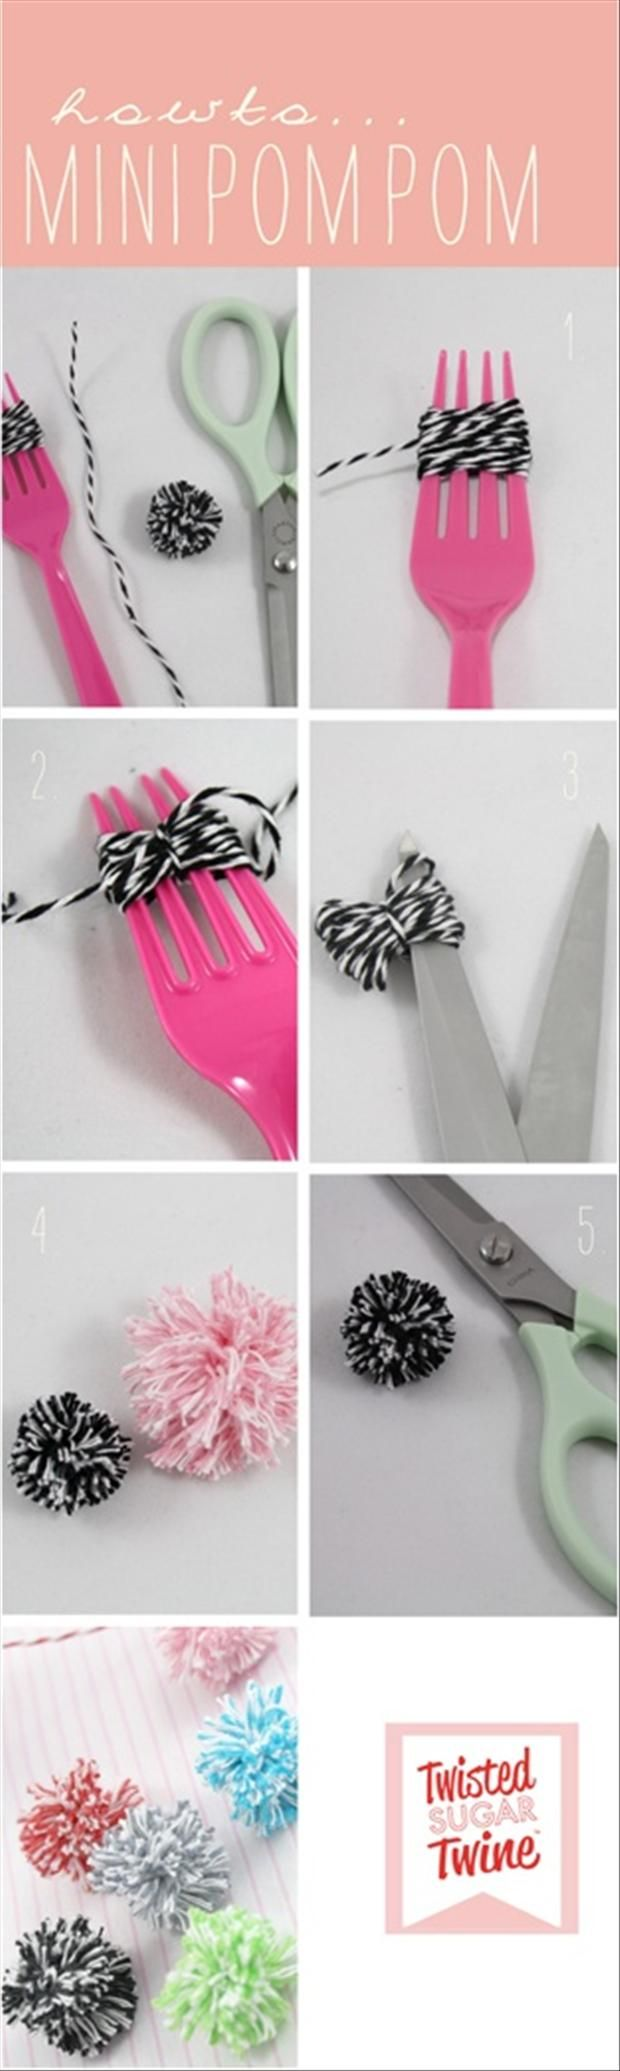 how to make mini pom poms   crafting   pinterest   minis, cheer